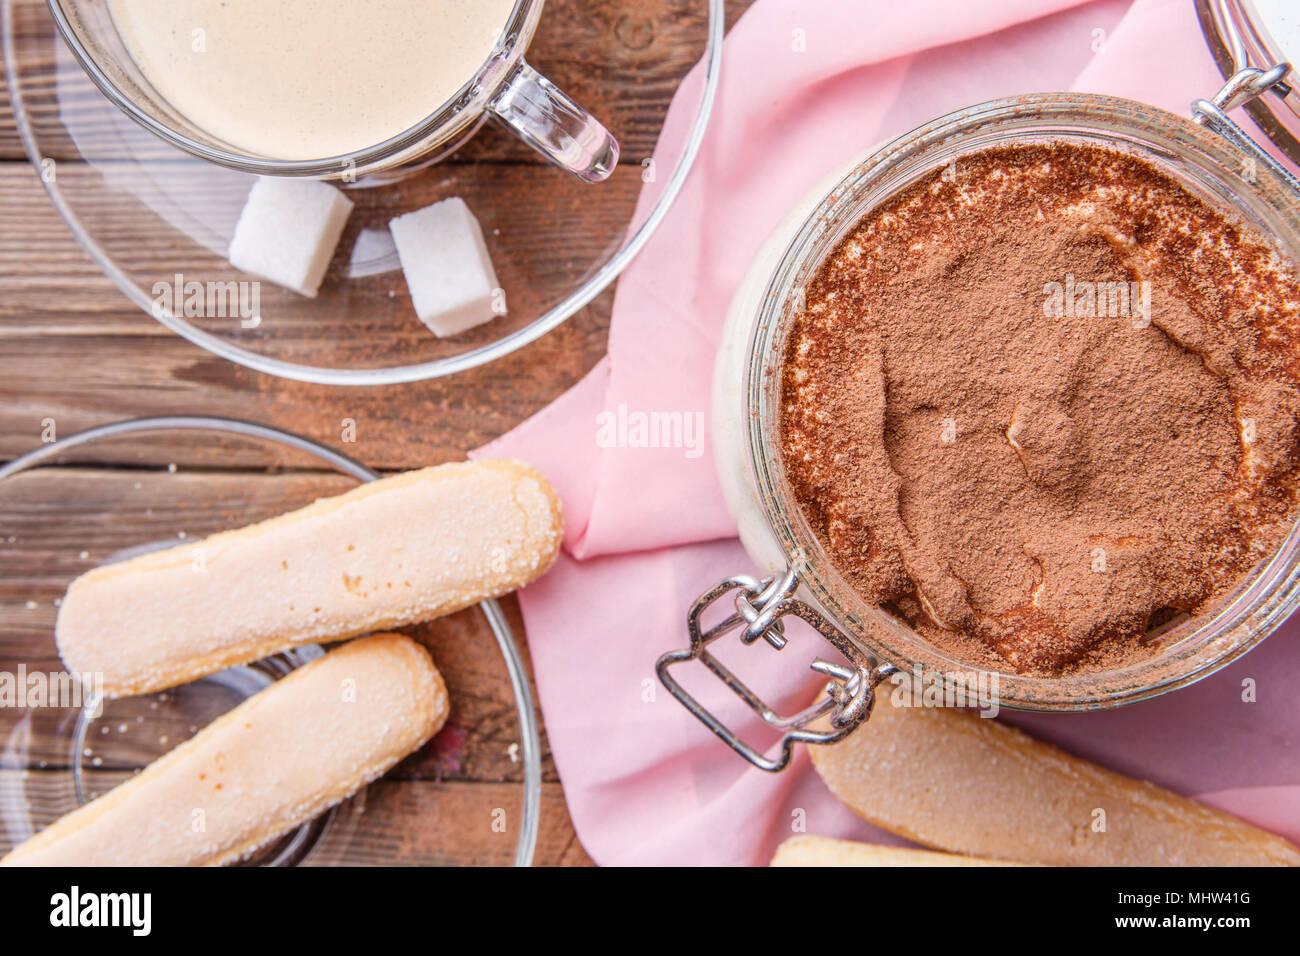 Tiramisu, savoiardi biscuits with mug - Stock Image